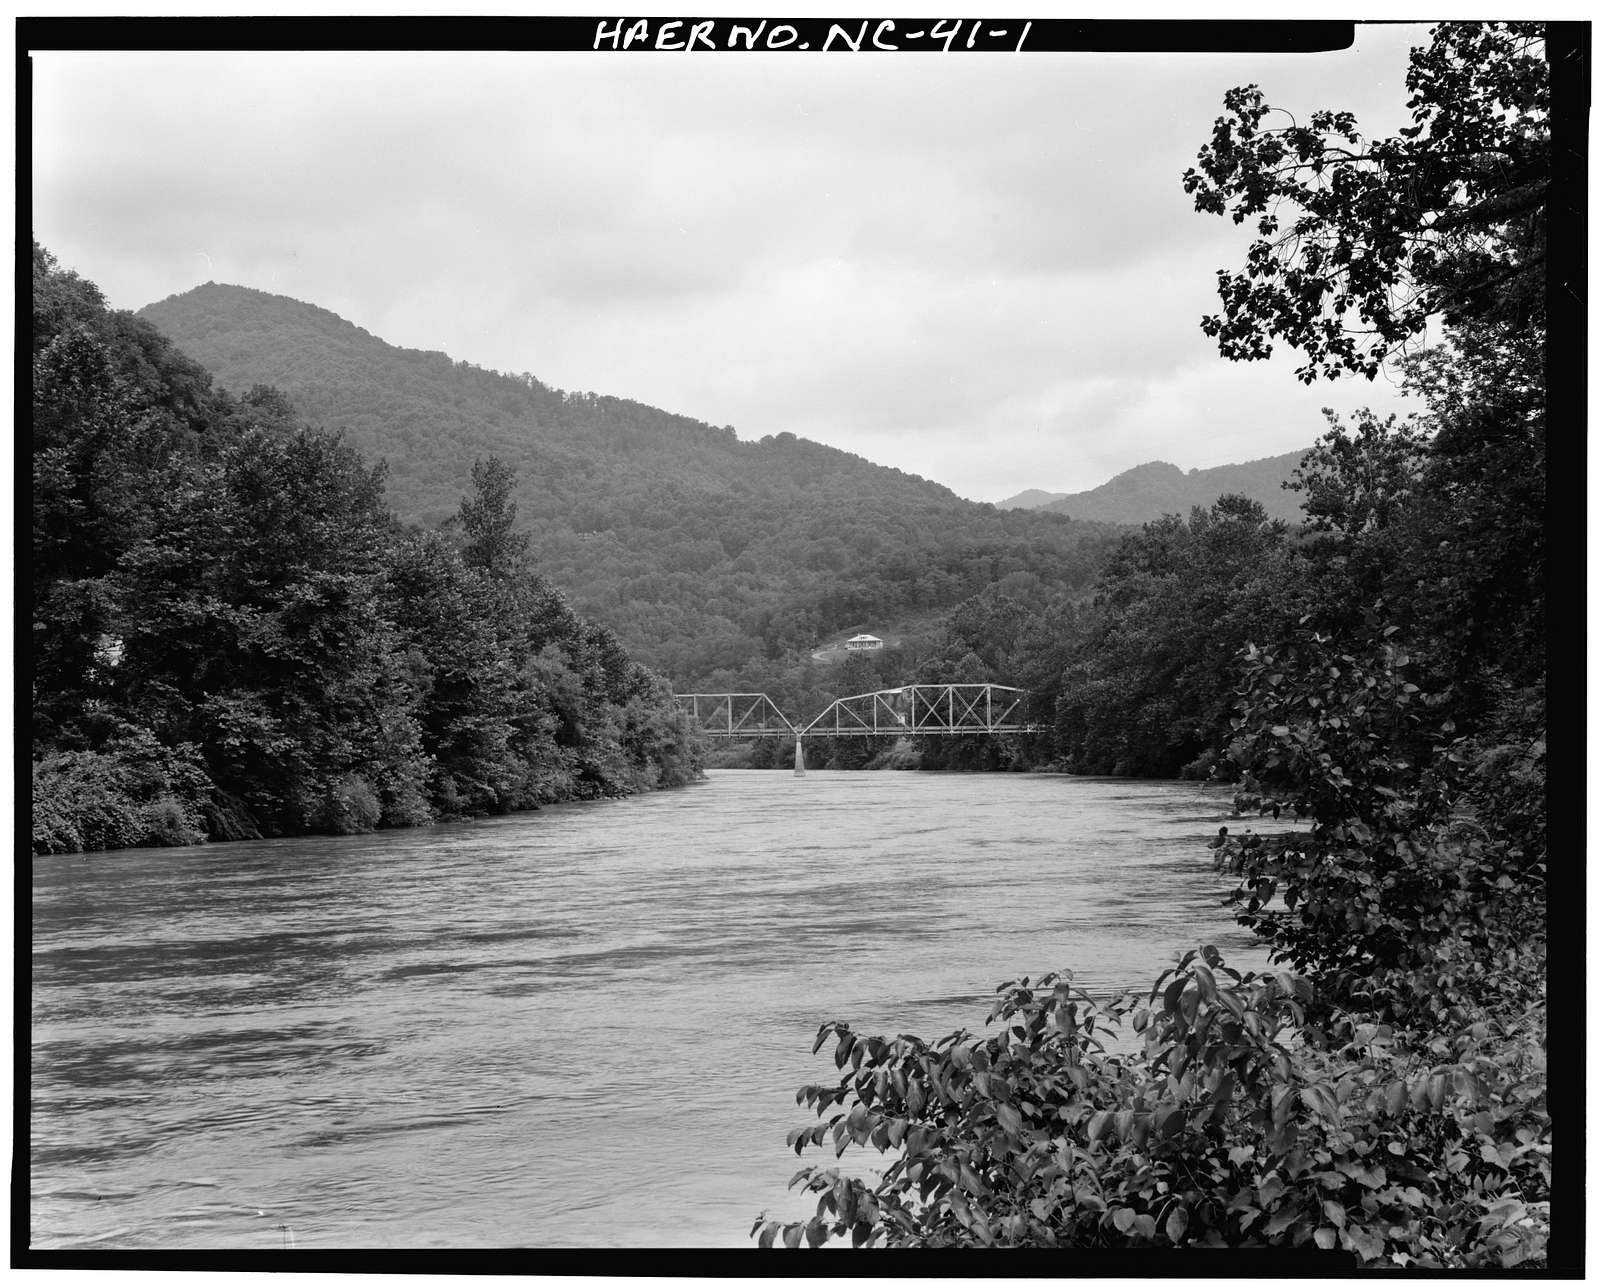 North Carolina Route 1314 Bridge, Spanning Toe River, Relief, Mitchell County, NC